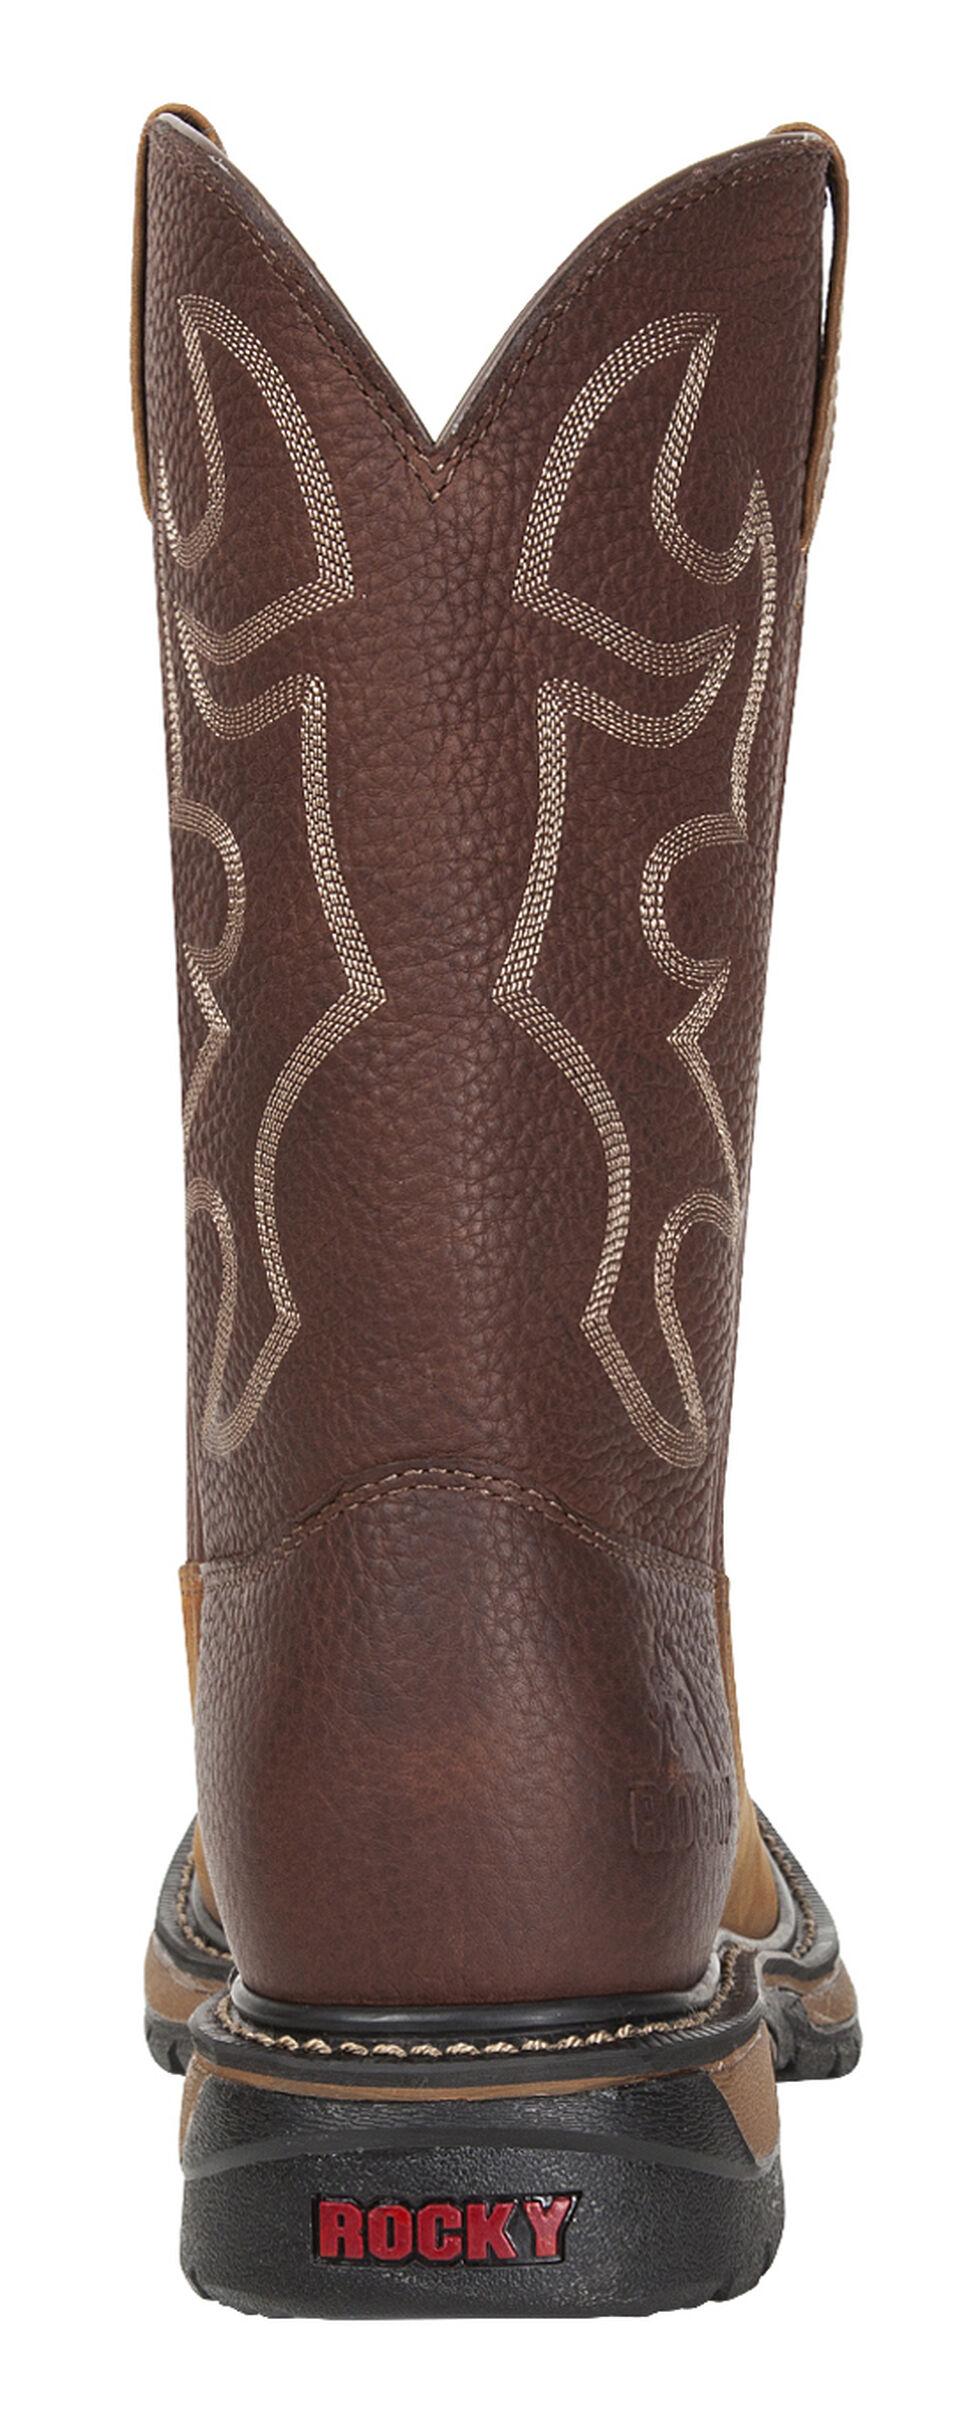 Rocky Original Ride Western Boots - Square Toe, Brown, hi-res